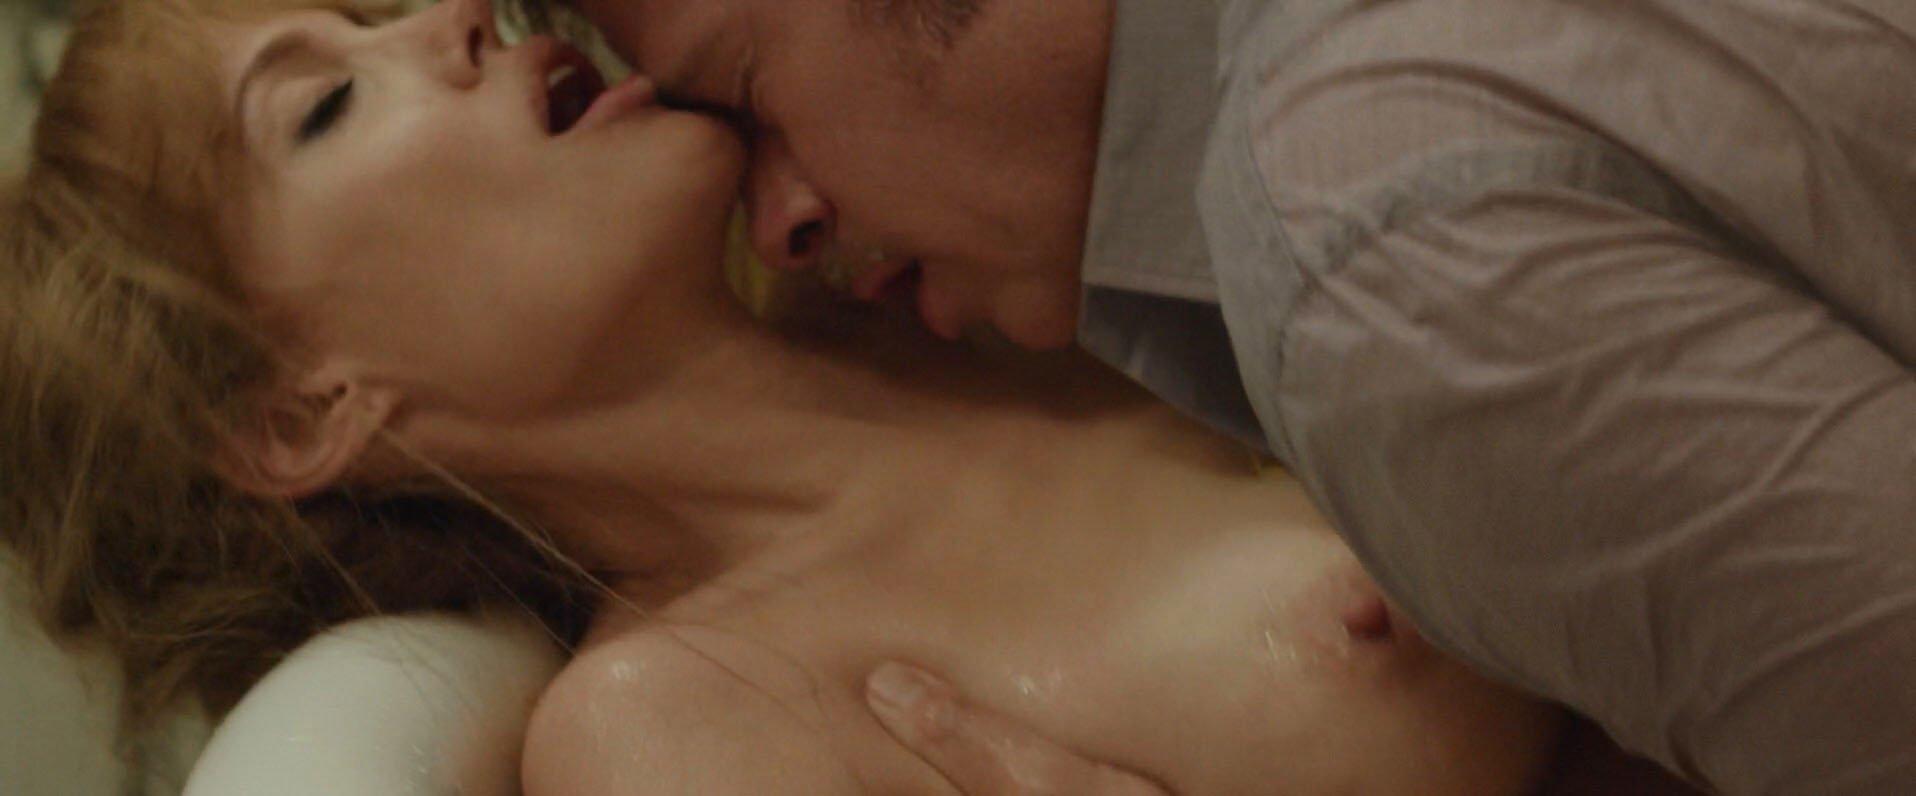 Angelina Jolie Naked Taking Lives angelina jolie sex show.